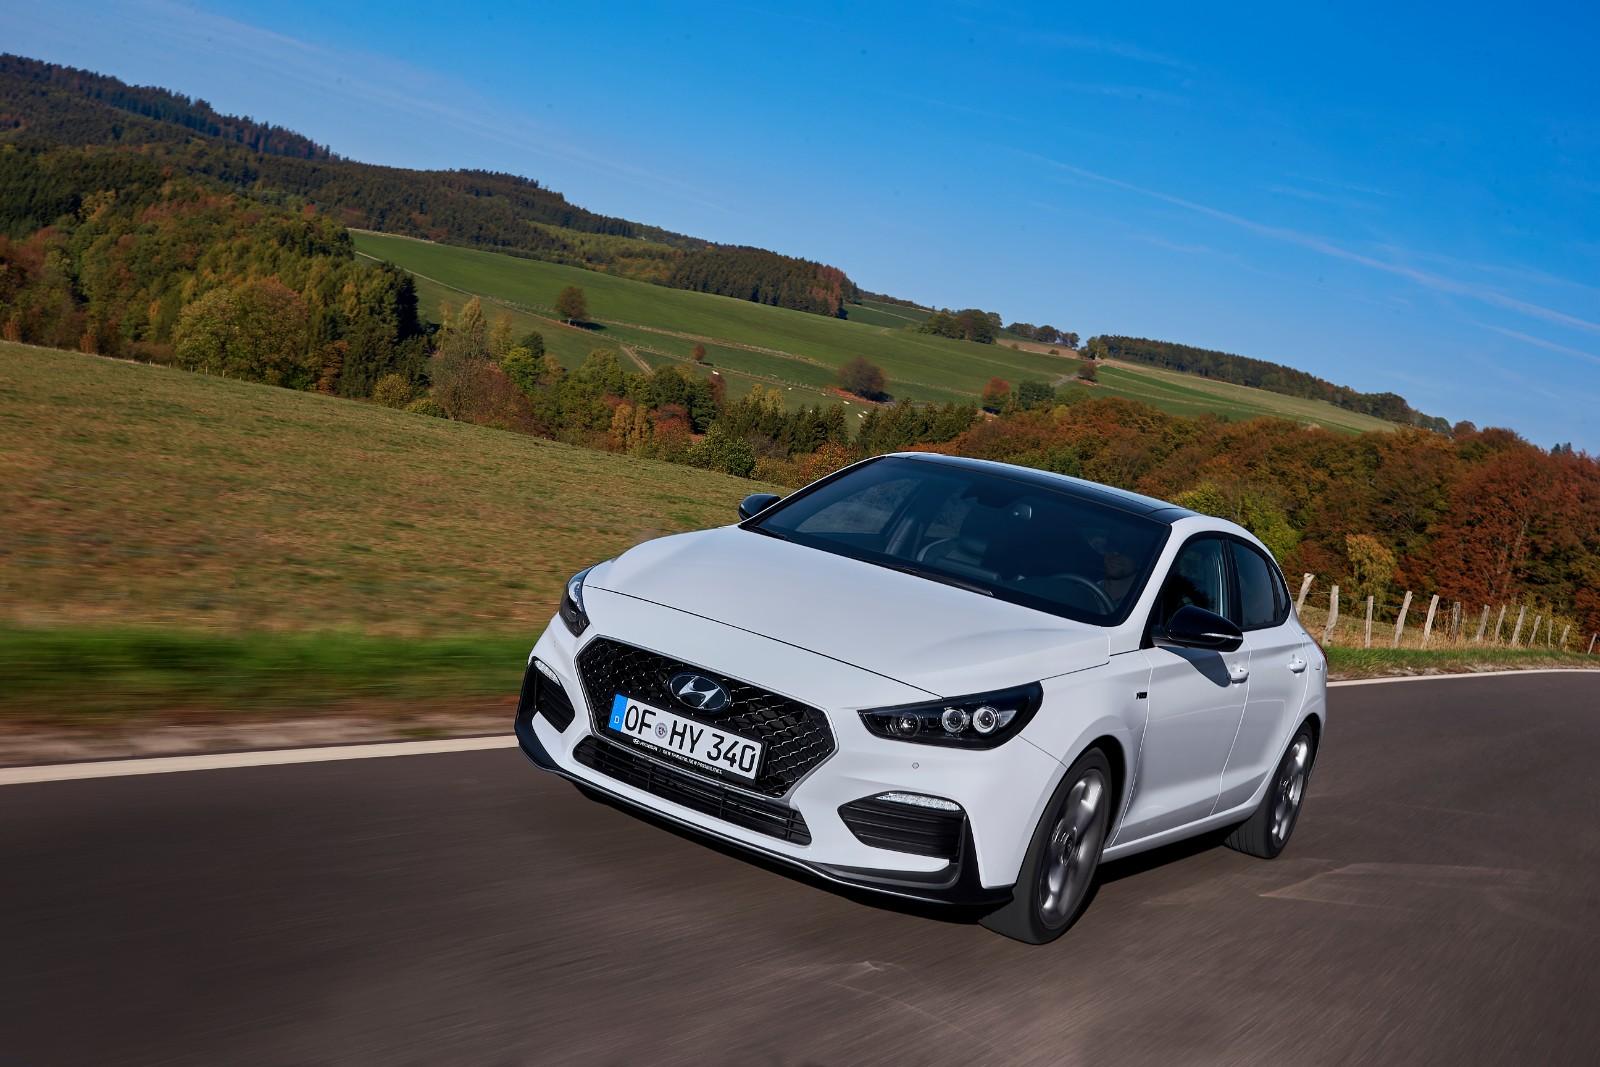 2017 - [Hyundai] i30 Fastback - Page 3 955610l